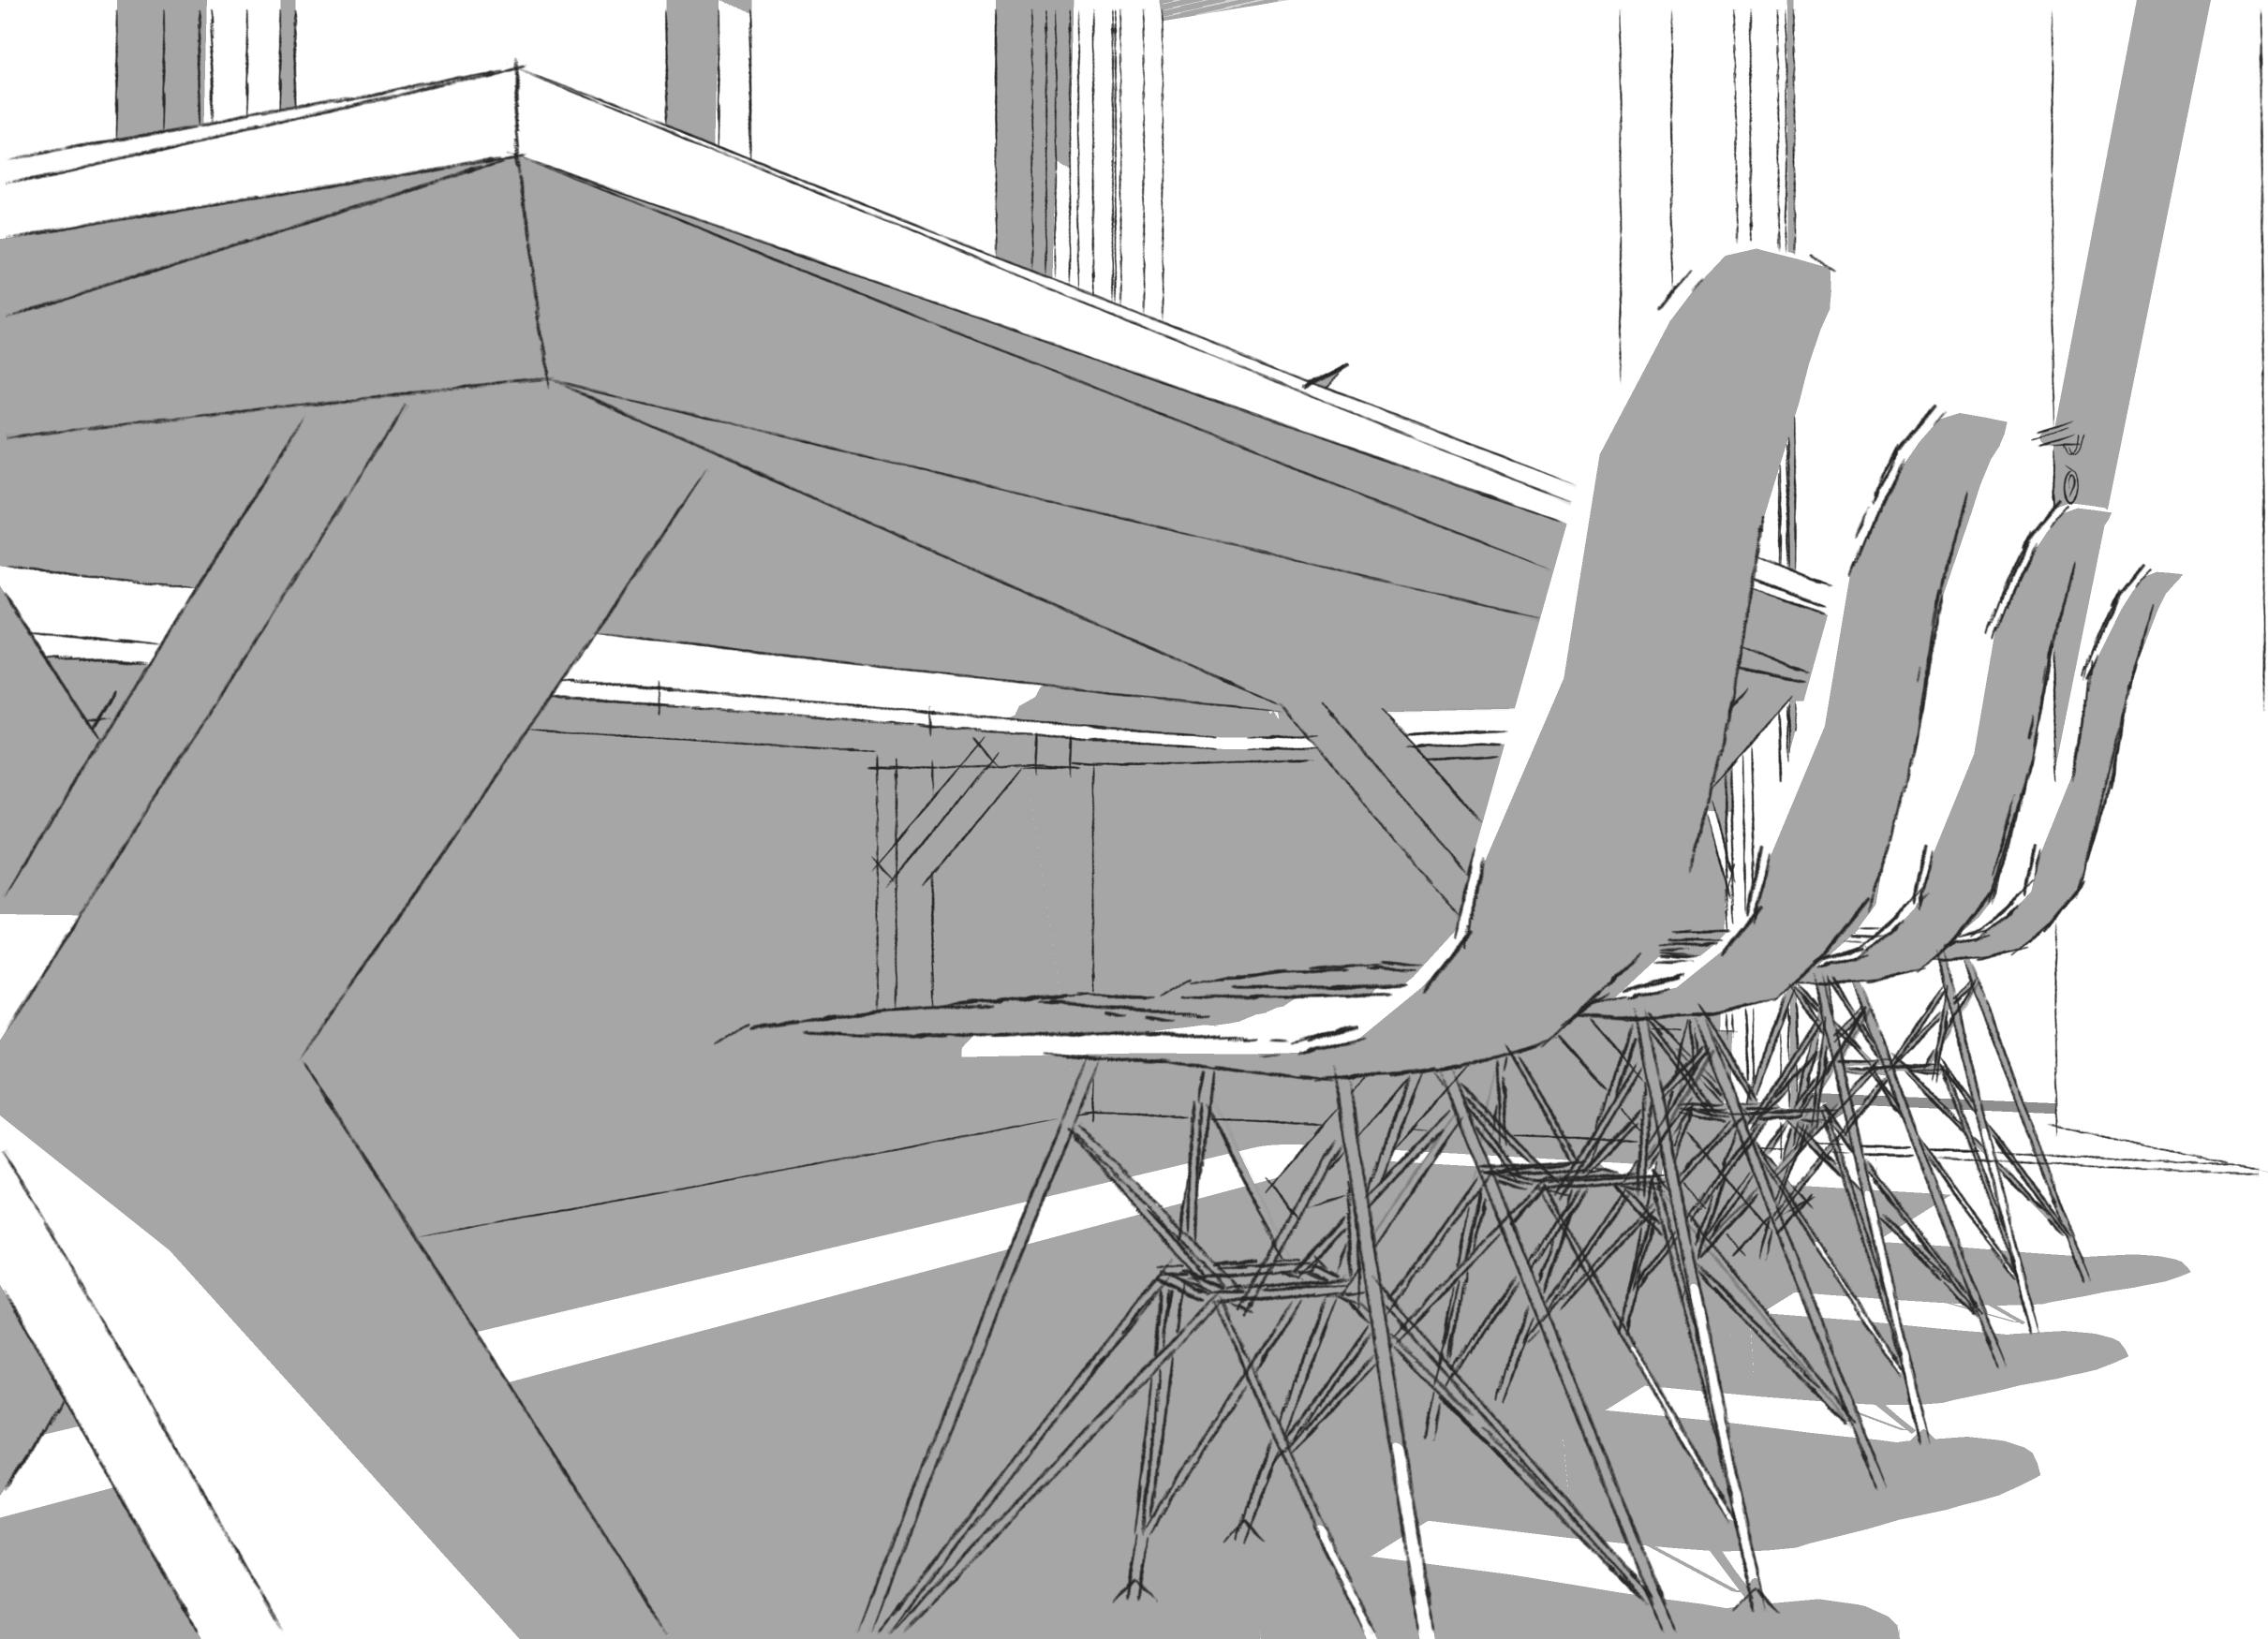 Interieur schetsen – Mudroom